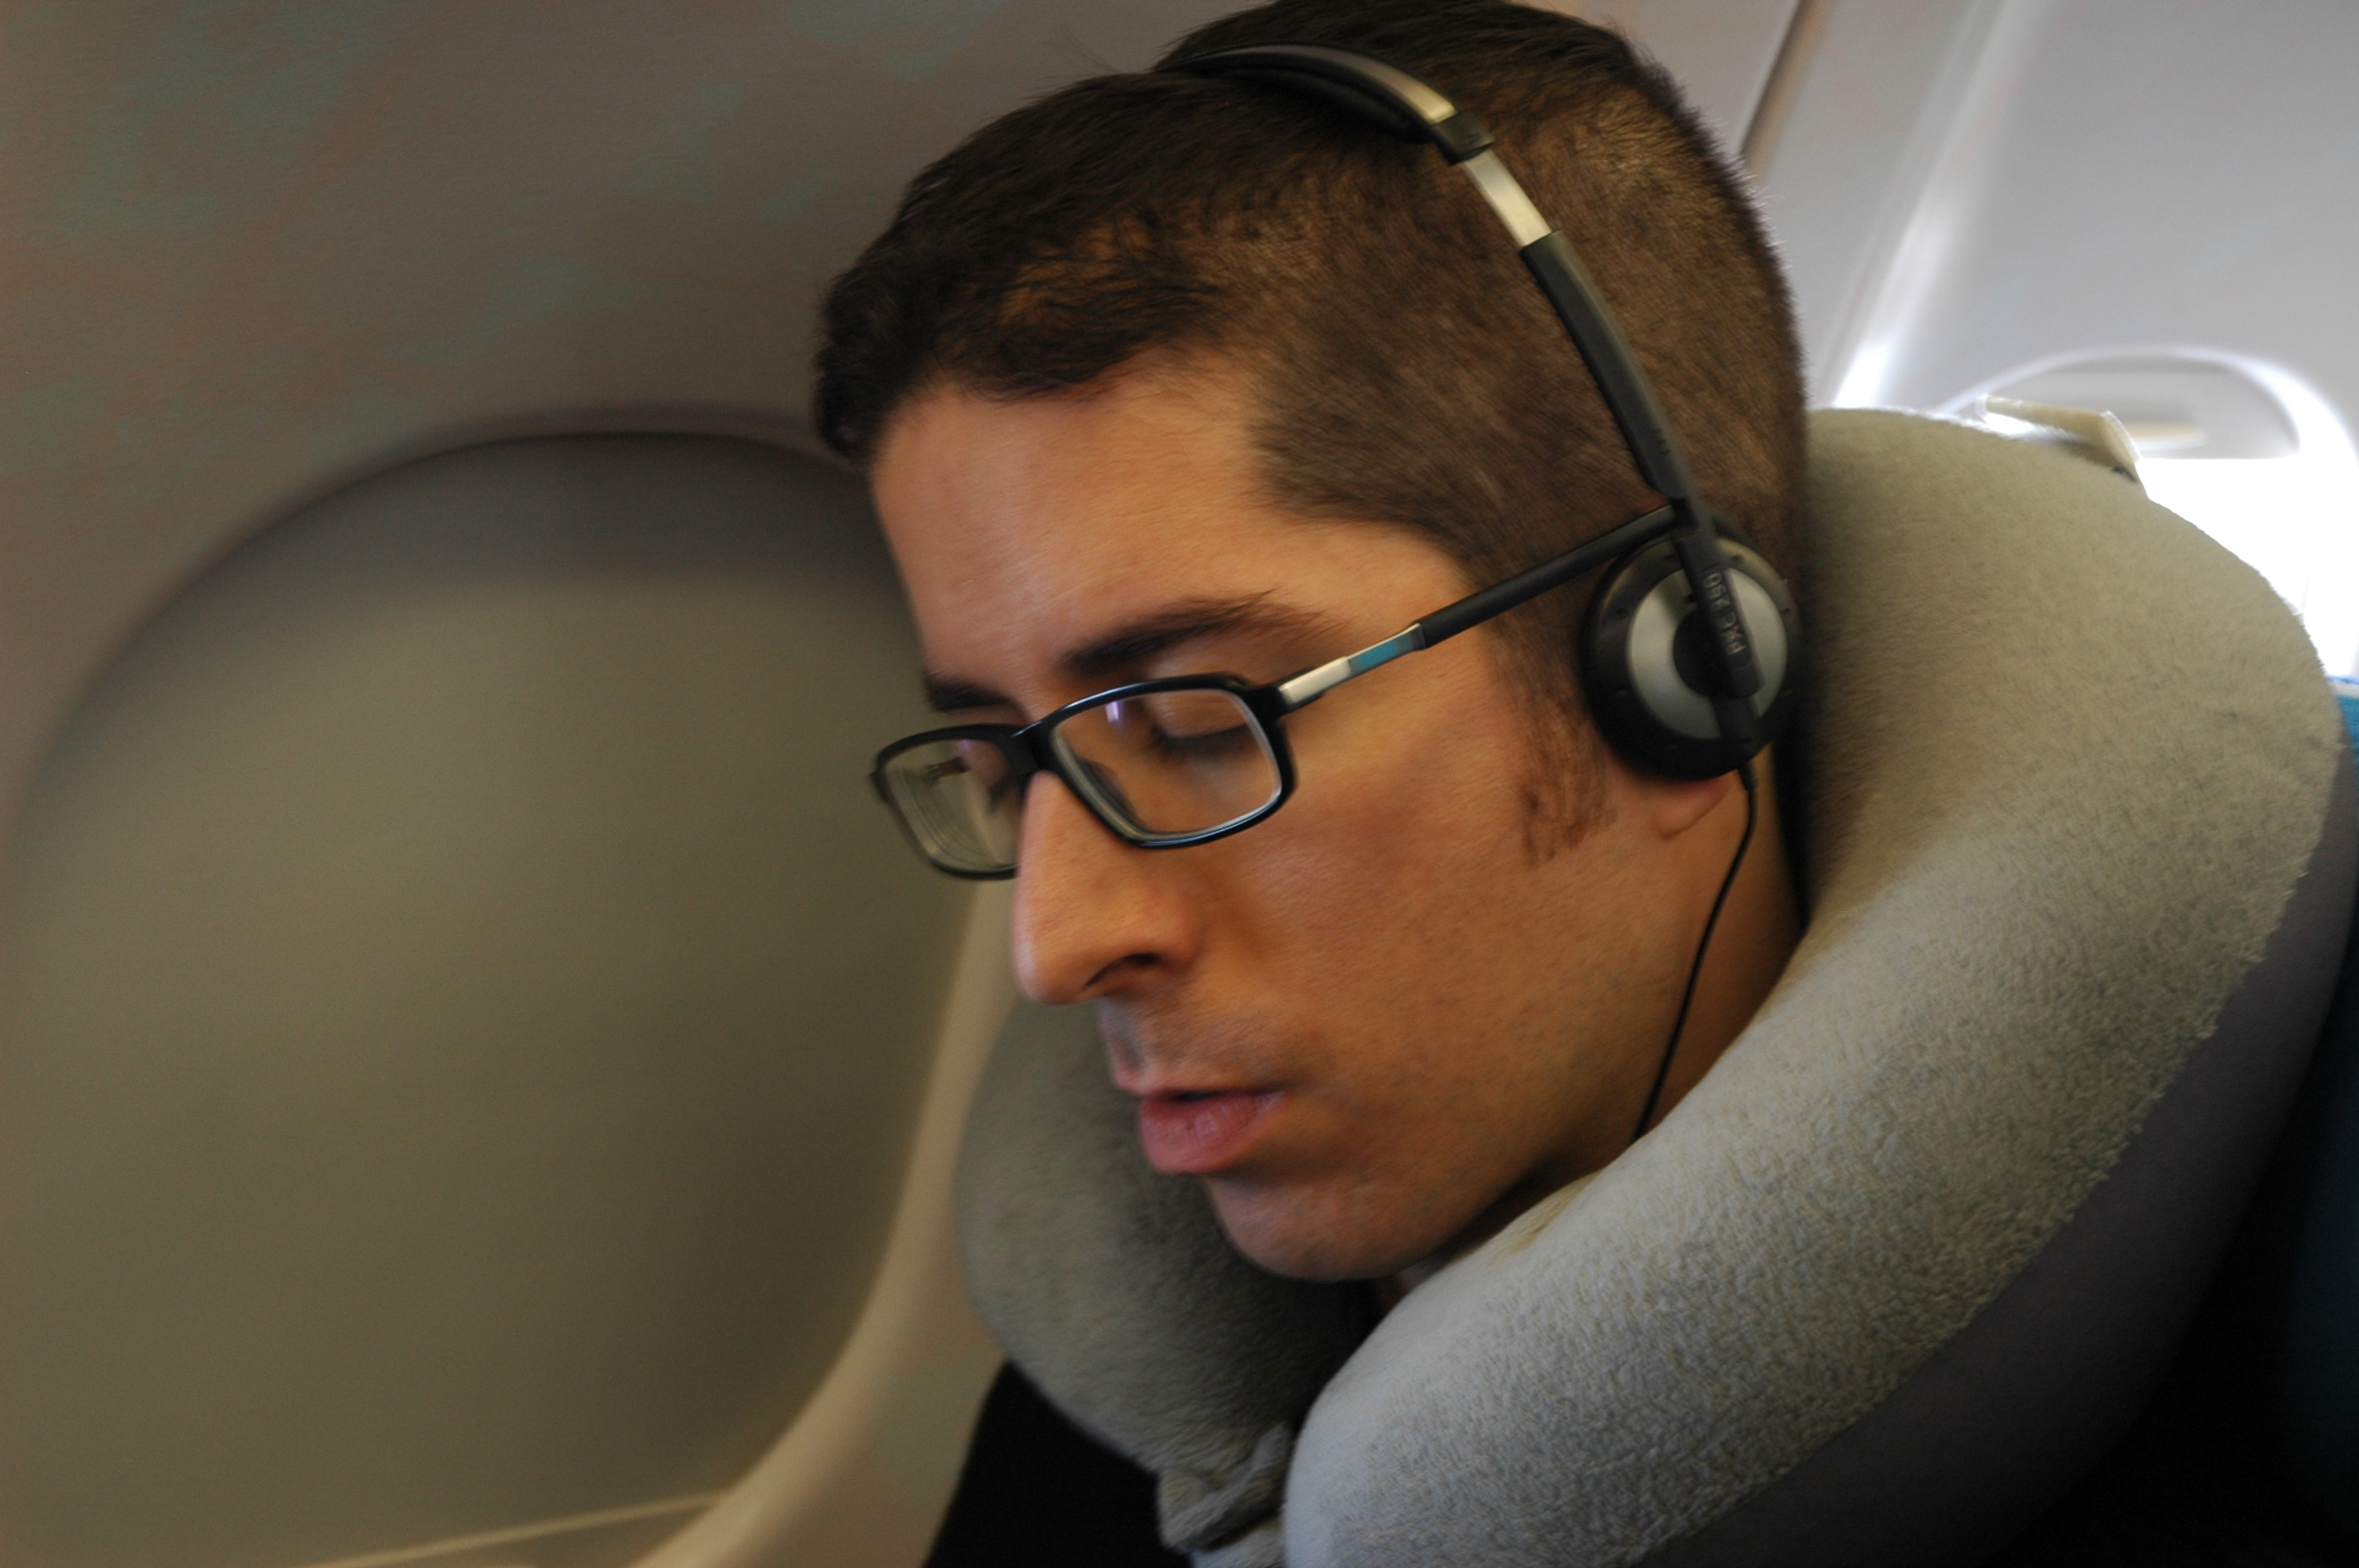 Rafa dort dans l'avion